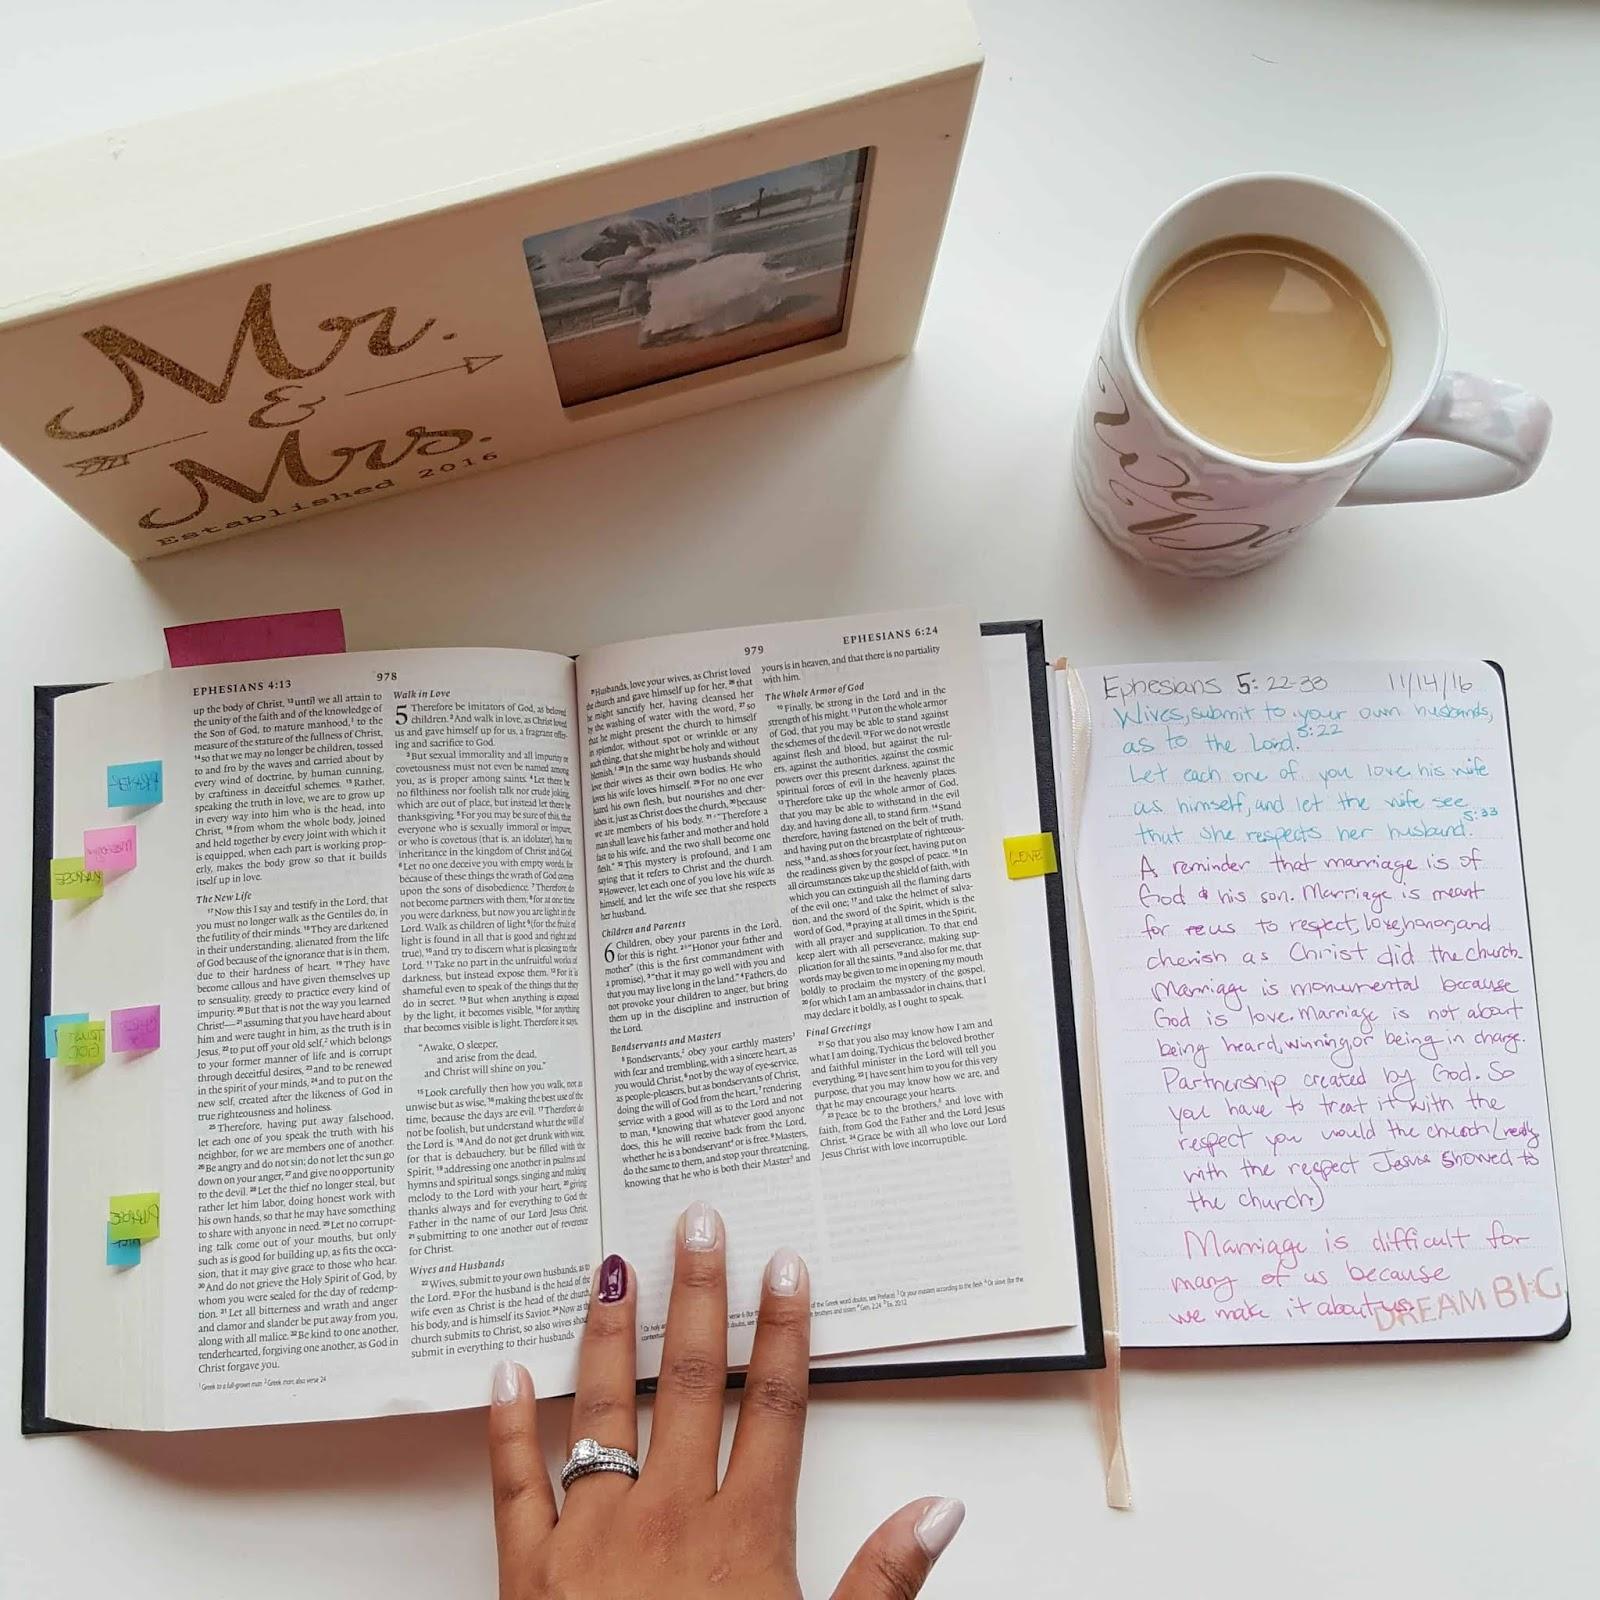 Encouraging Scripture | bible study printables | scripture studies | bible study reading plans #bibleverse #bible